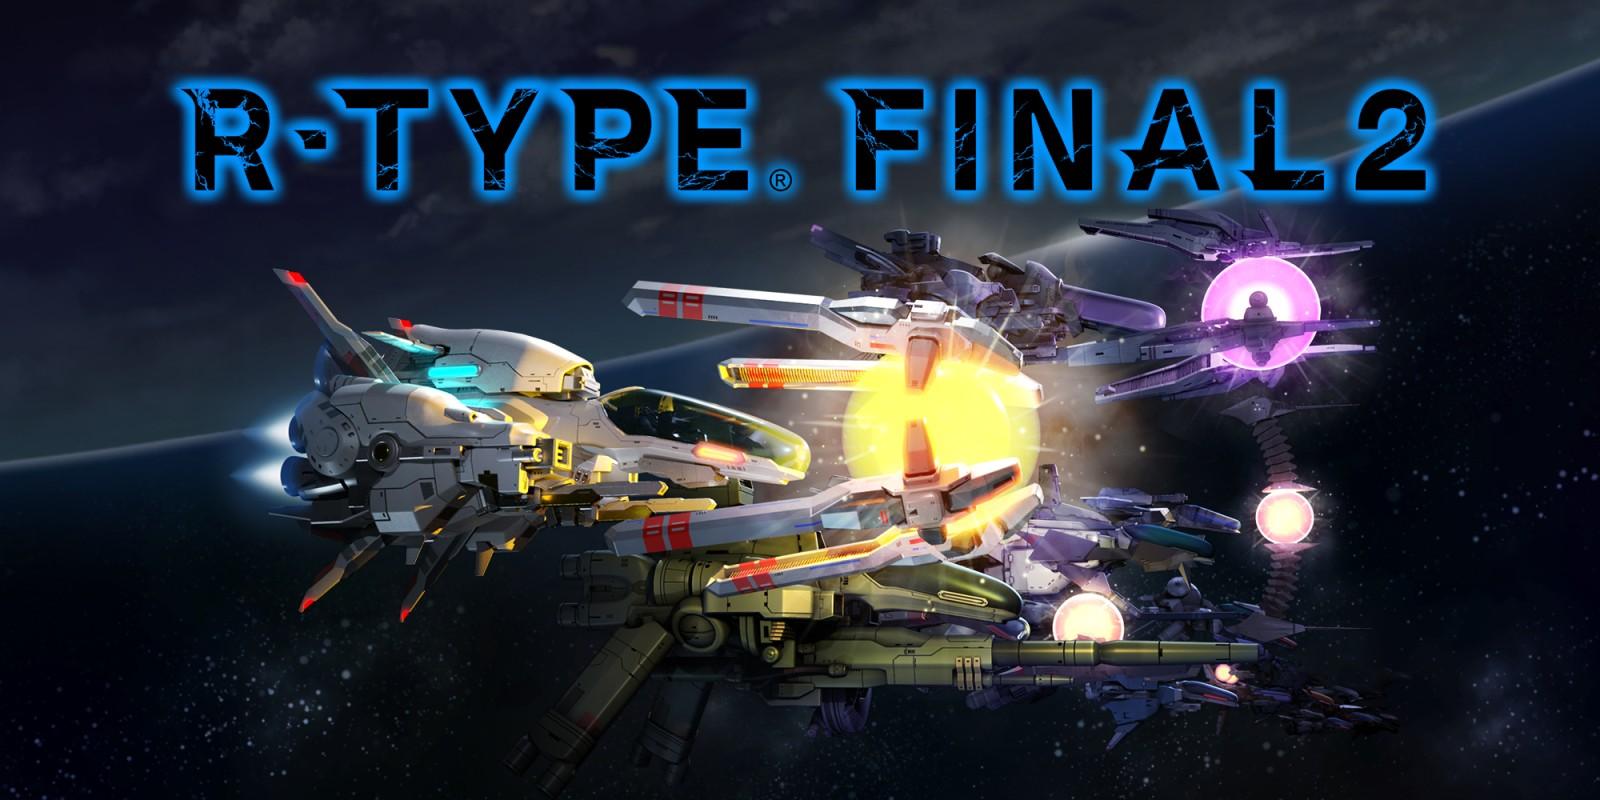 R-Type-Final 2